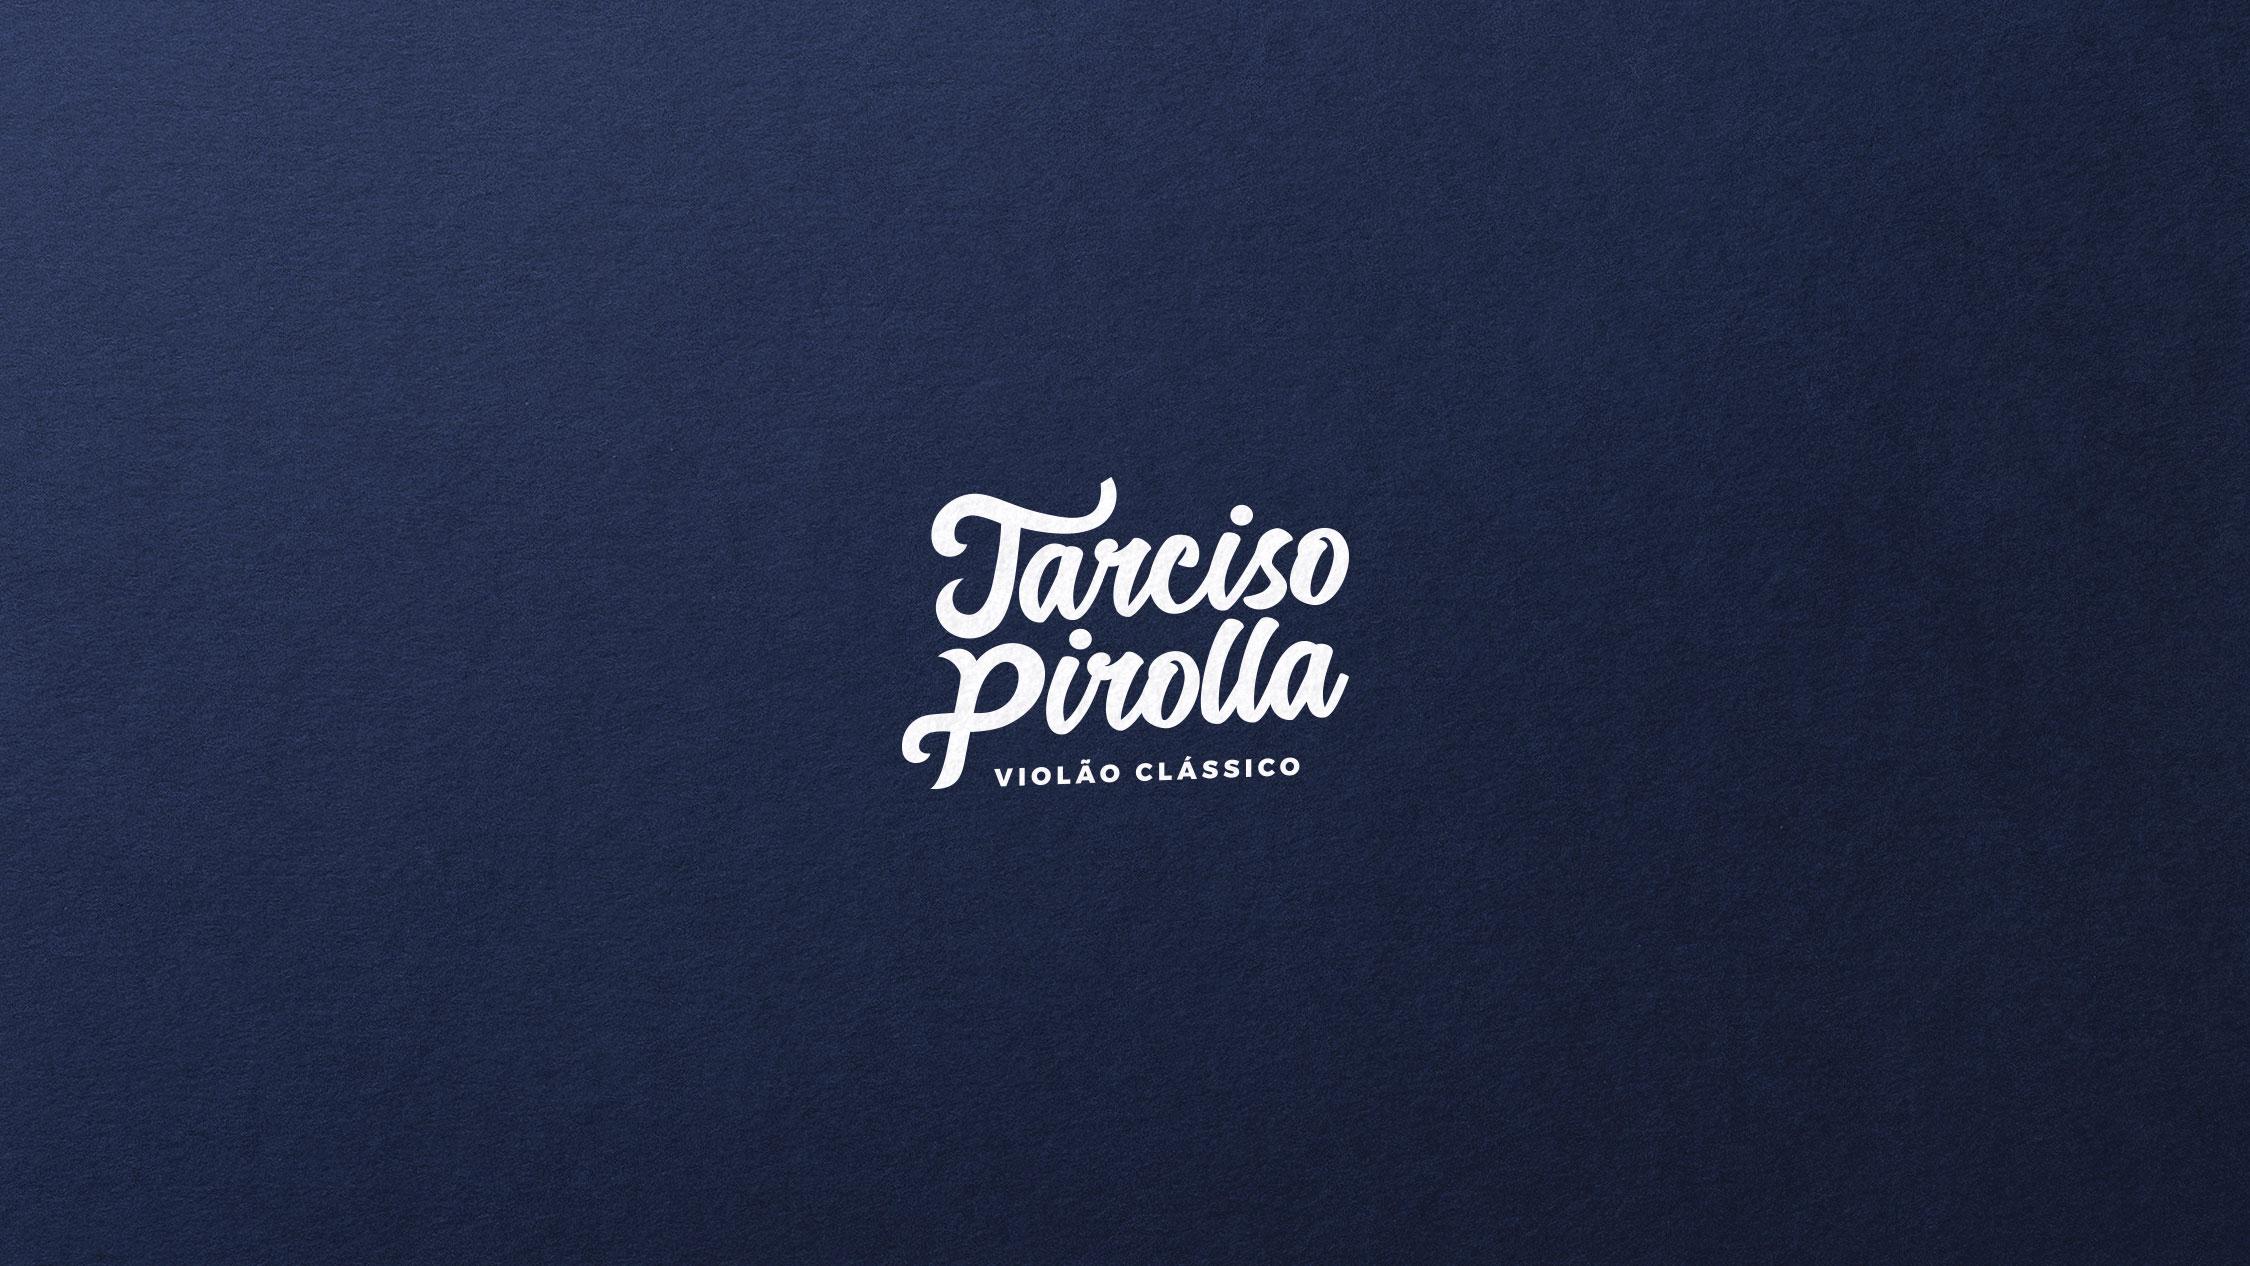 tarciso